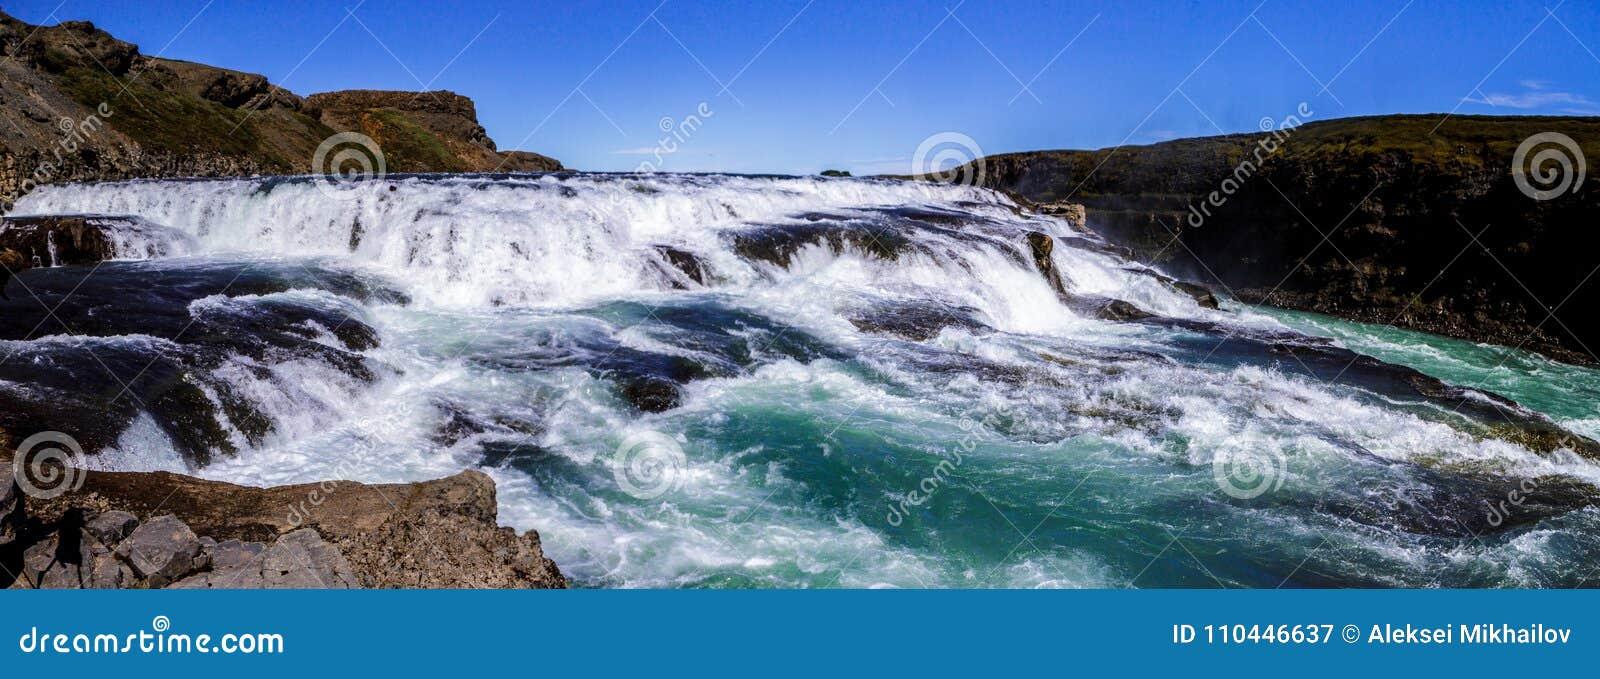 Panorama of the beautiful Gullfoss waterfall in Iceland 11.06,2017